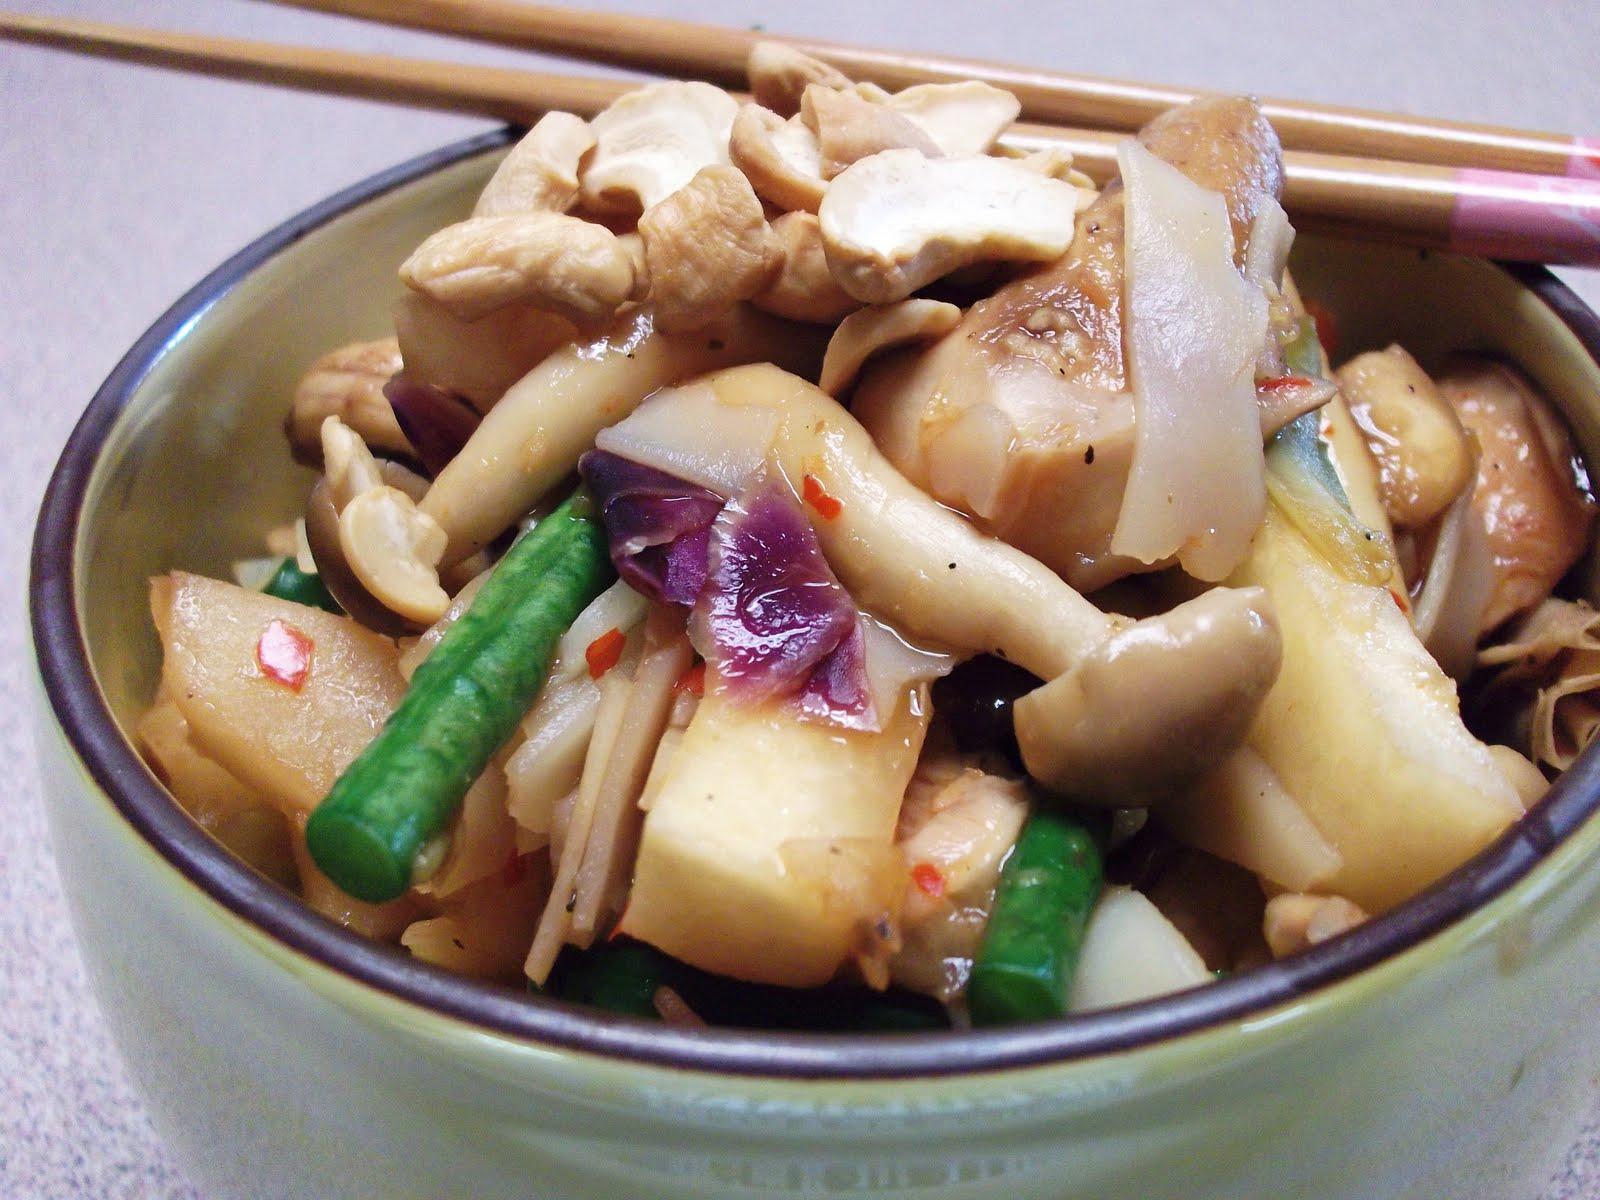 ... Another [Vegan] Health Freak: Bean Curd Skin and Pho Noodle Stir Fry